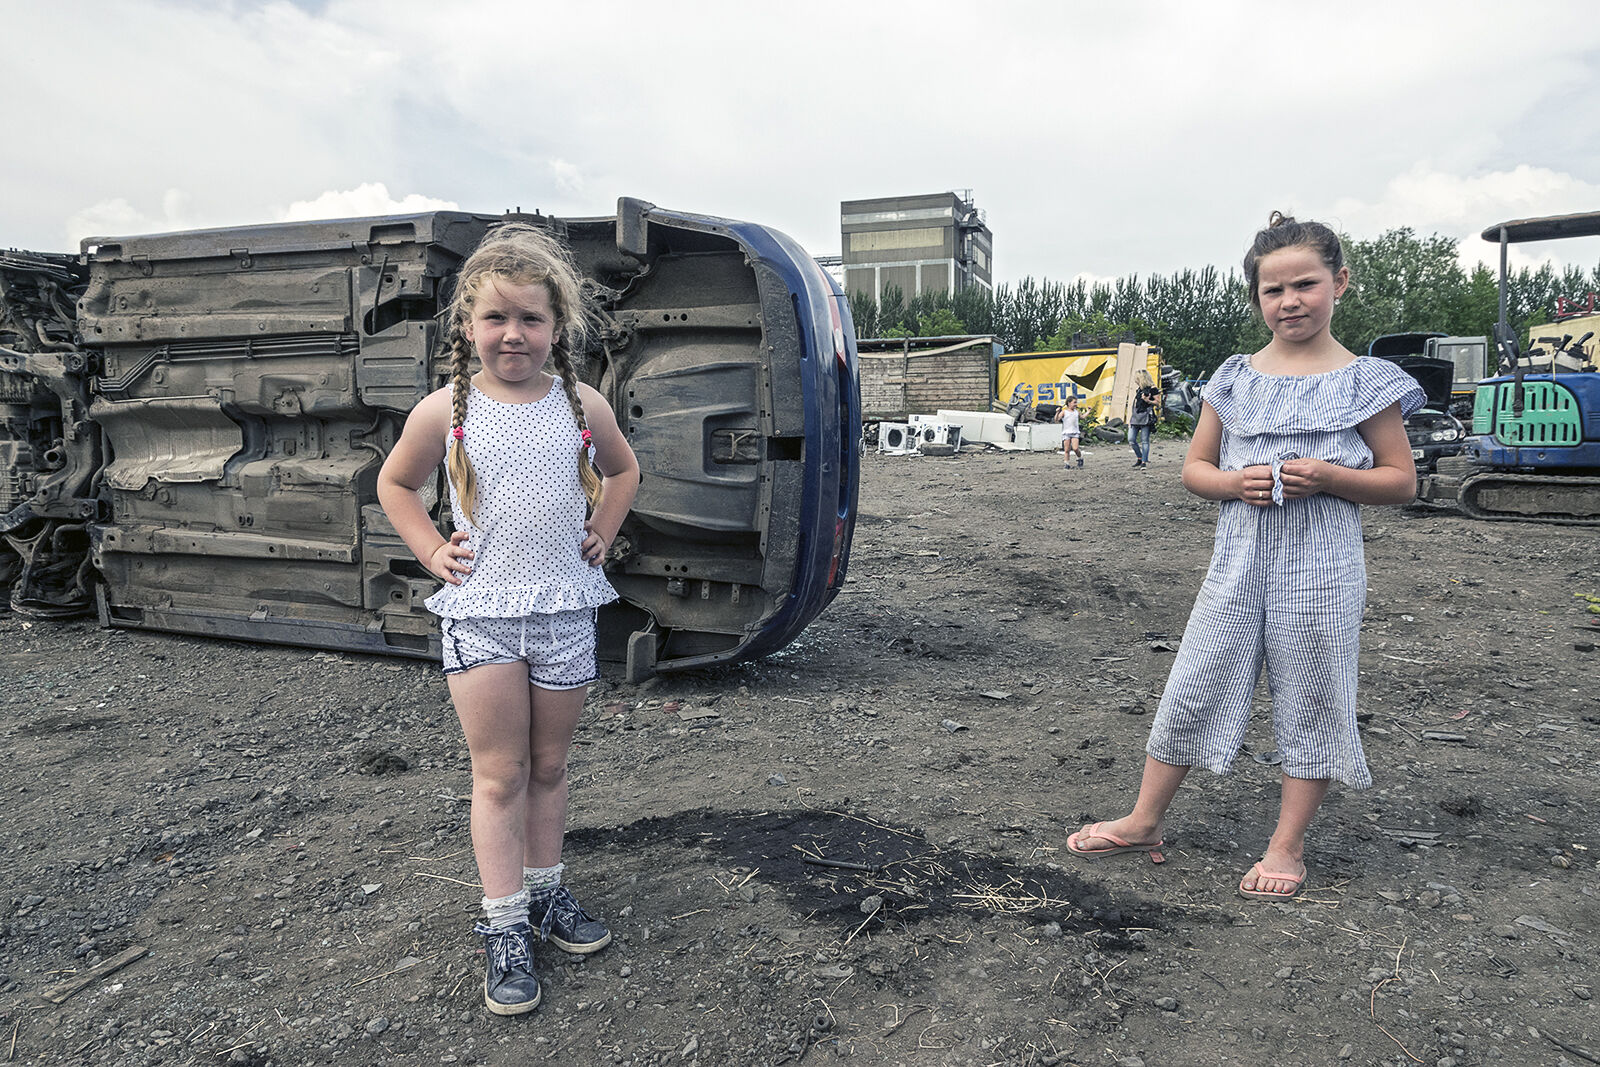 Donoghue Sisters, Limerick, Ireland 2018